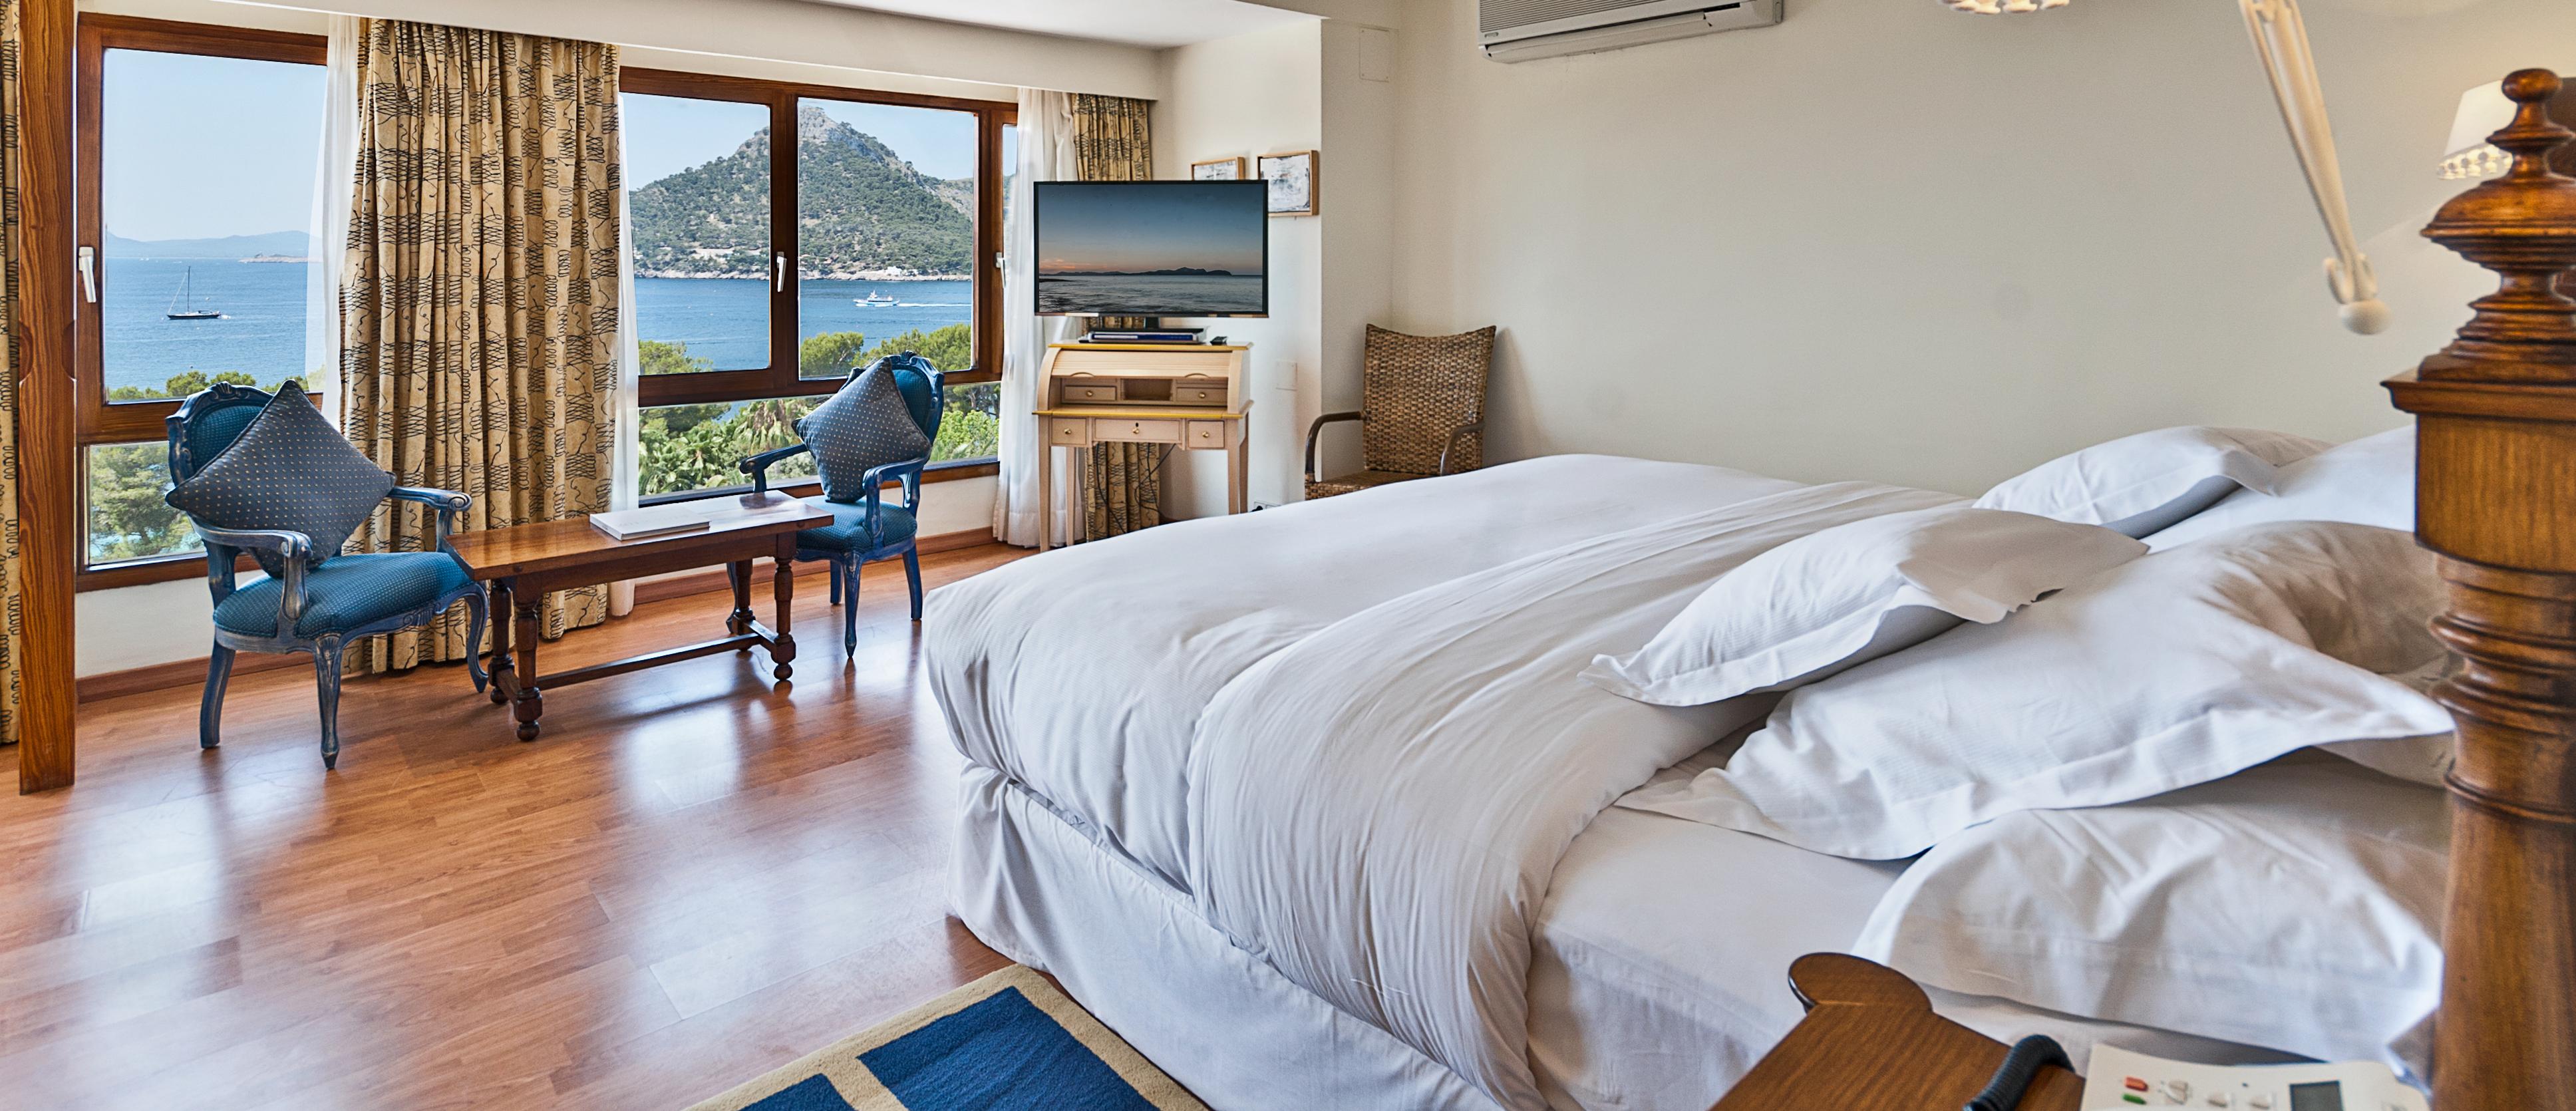 luxury-accommodation-hotel-formentor